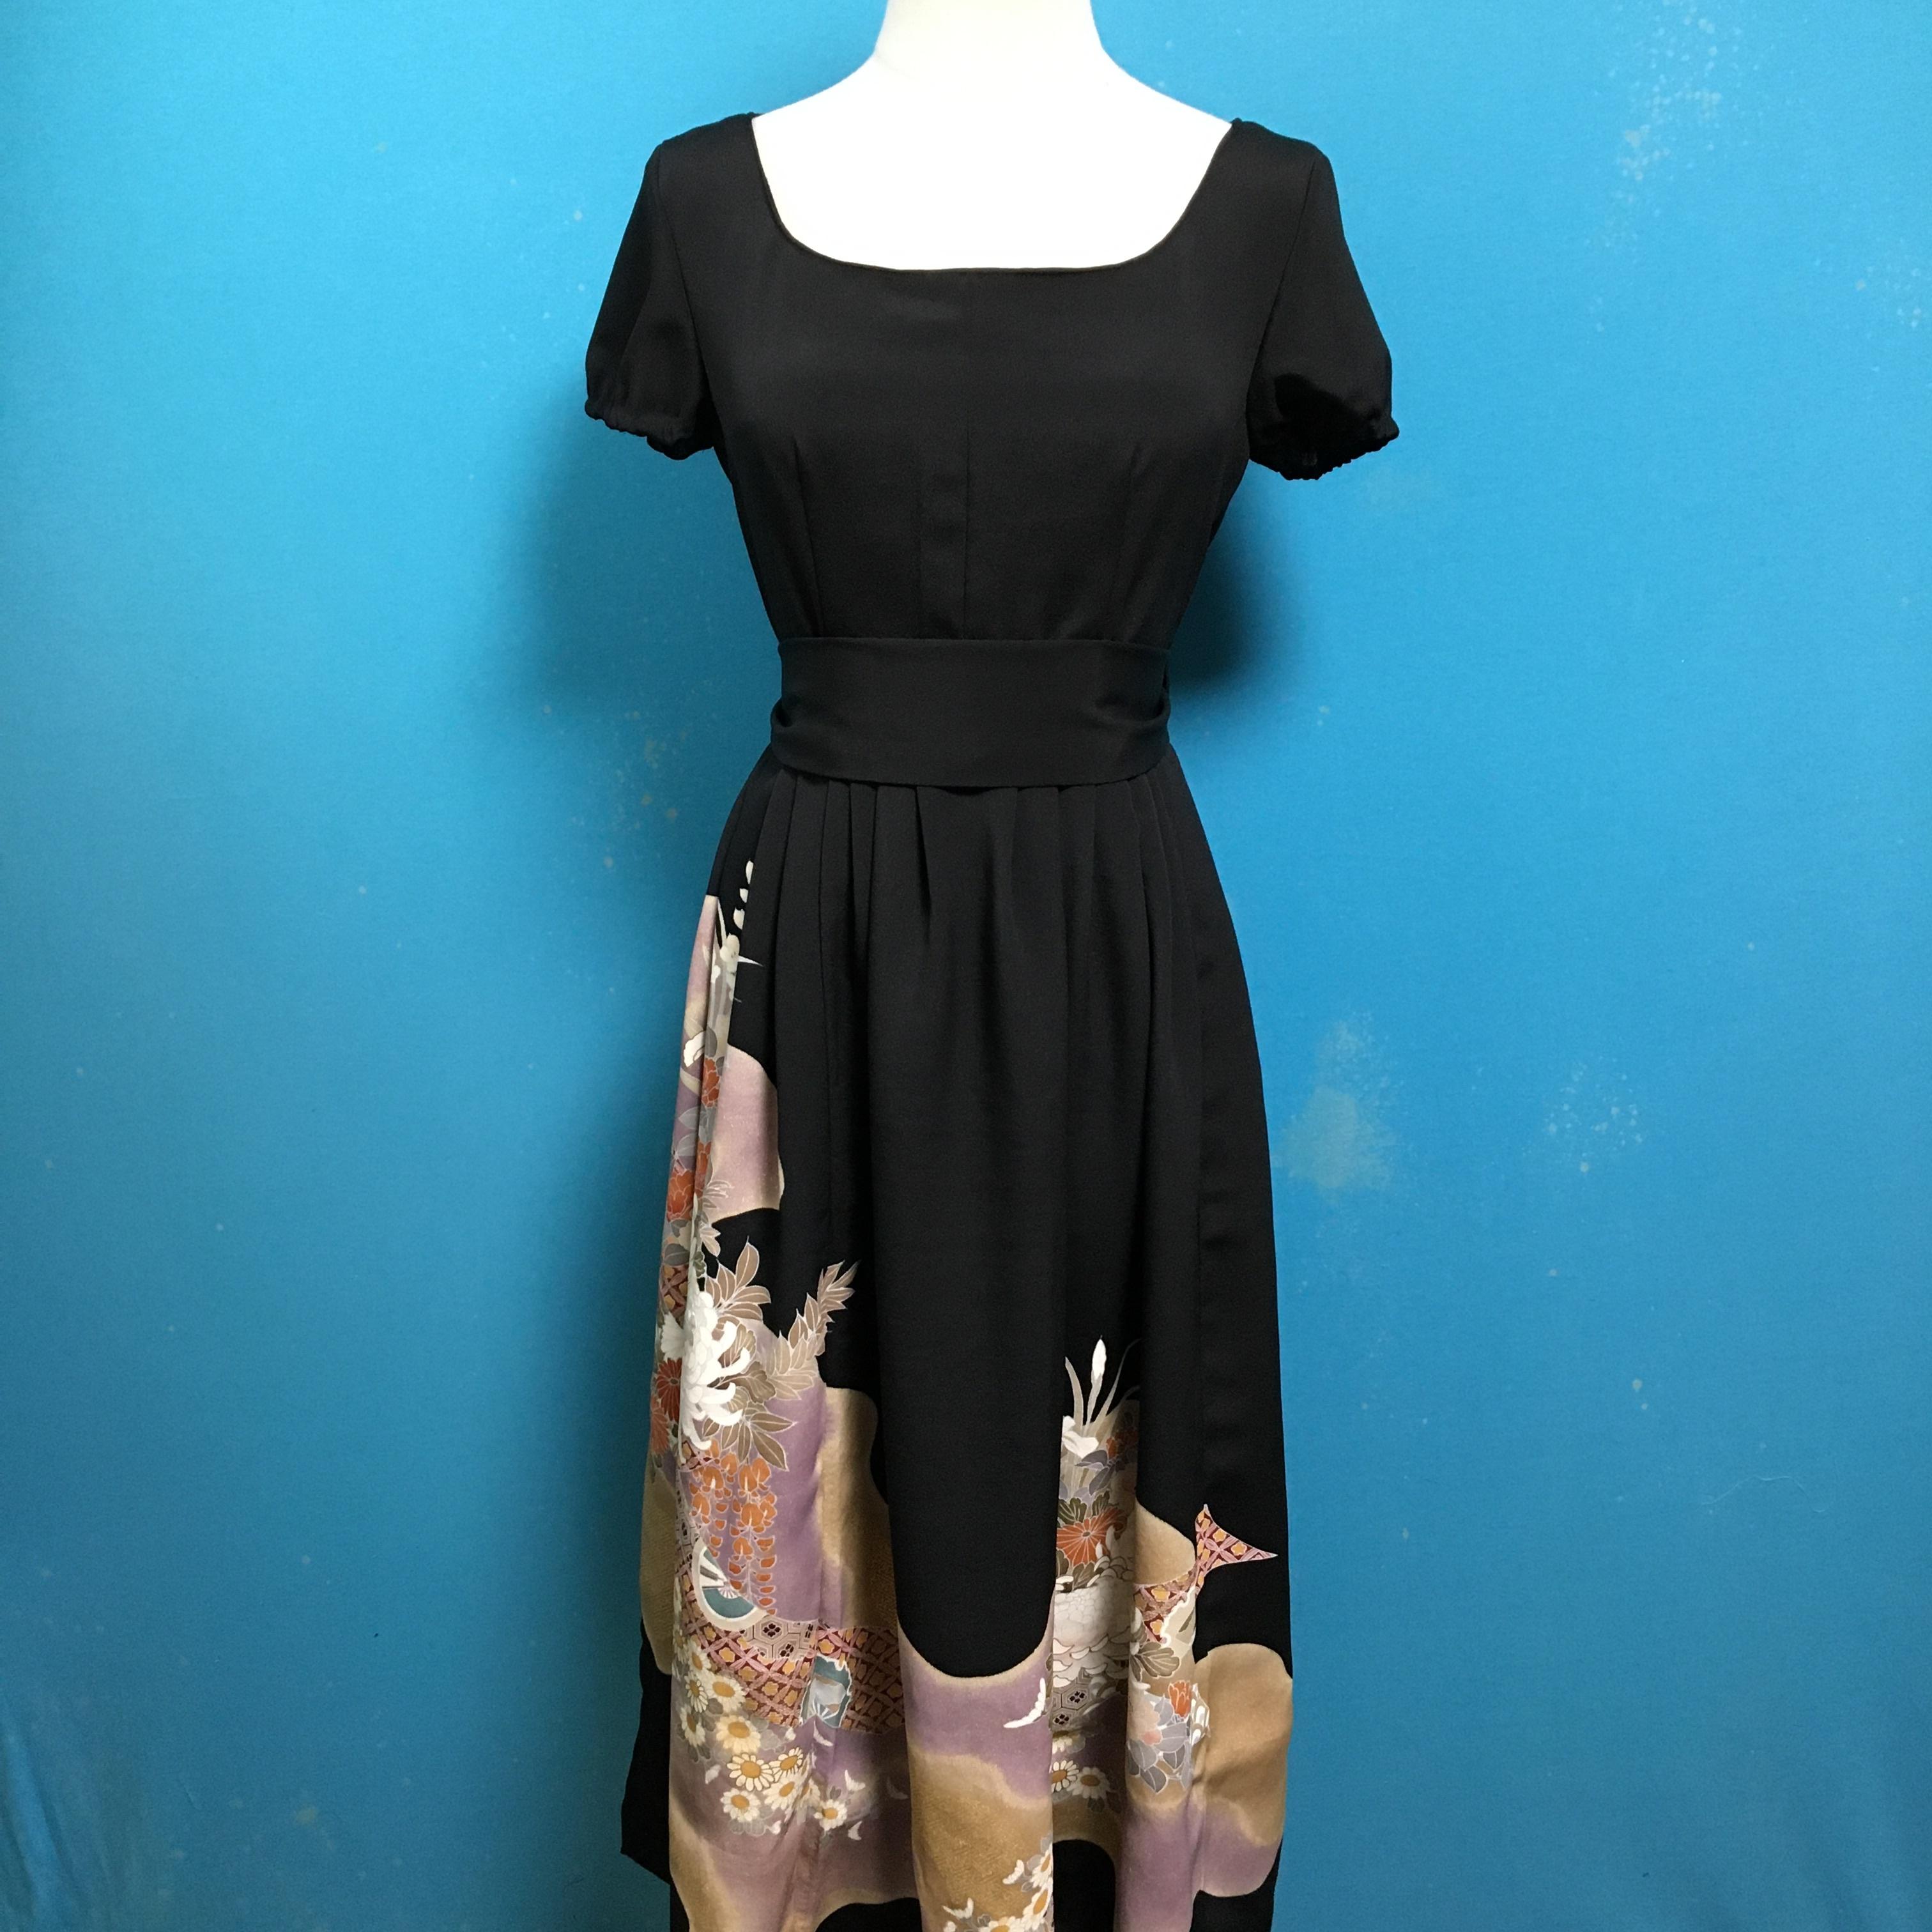 Vintage black kimono dress/ US 6, embroidery